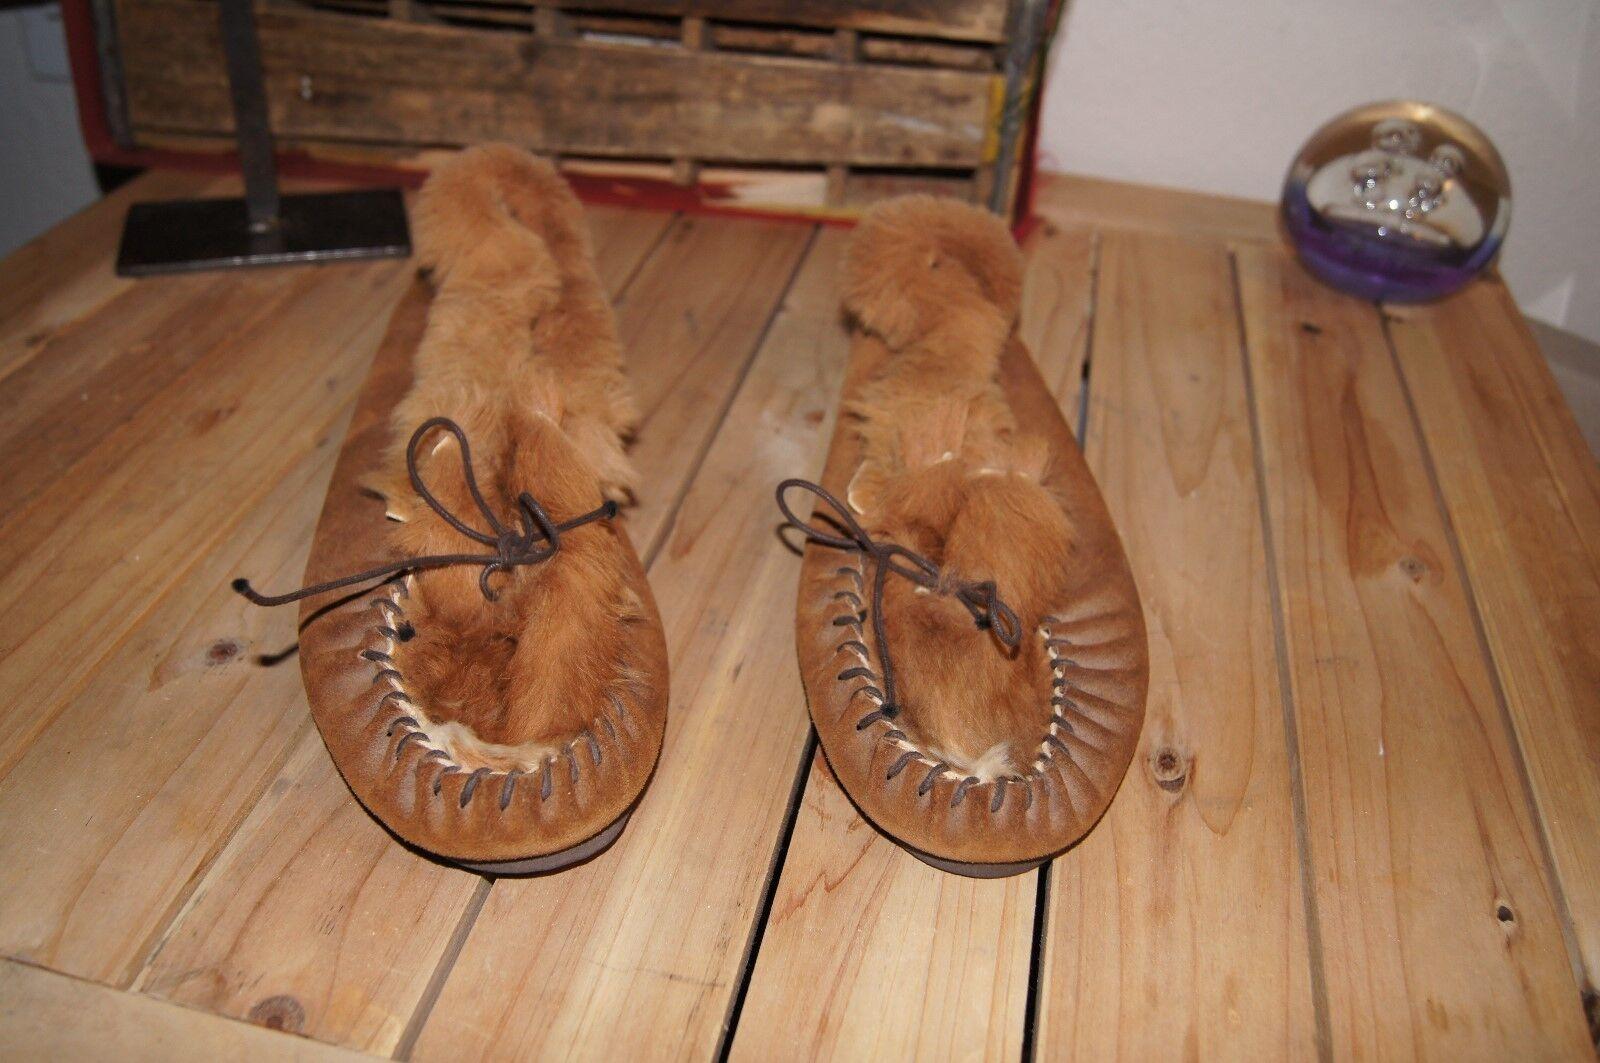 Pantofole da uomo KANGAROO Fur Lined Leather Slippers 11.5 KANGAROO LOAFERS 11.5 KANGAROO SHOES